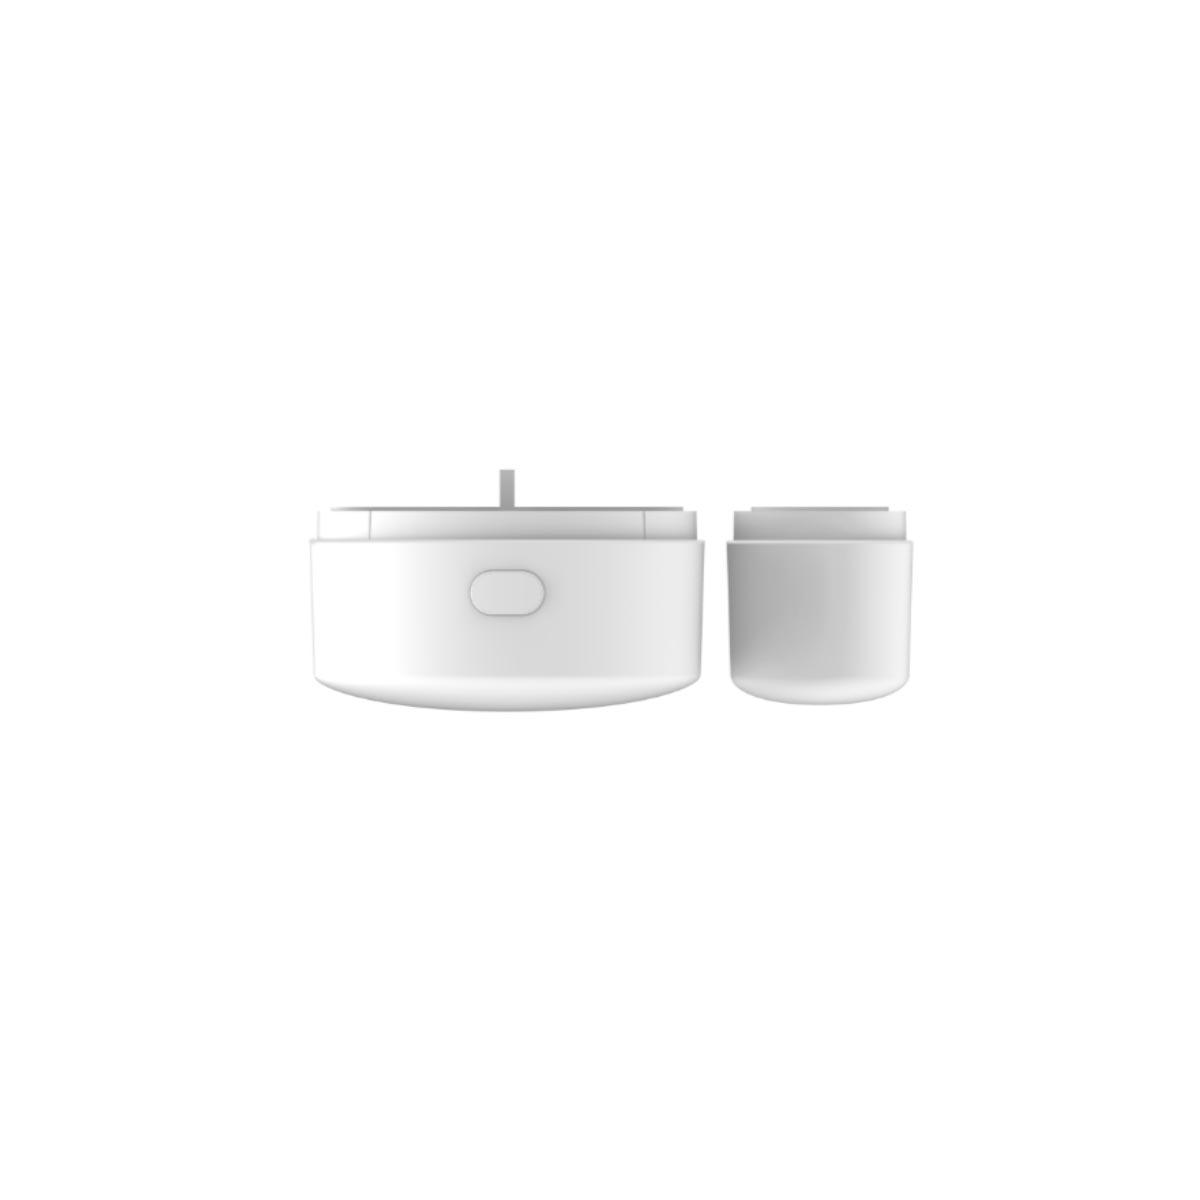 Kit 06 Sensor De Abertura Smart Intelbras Isa 1001